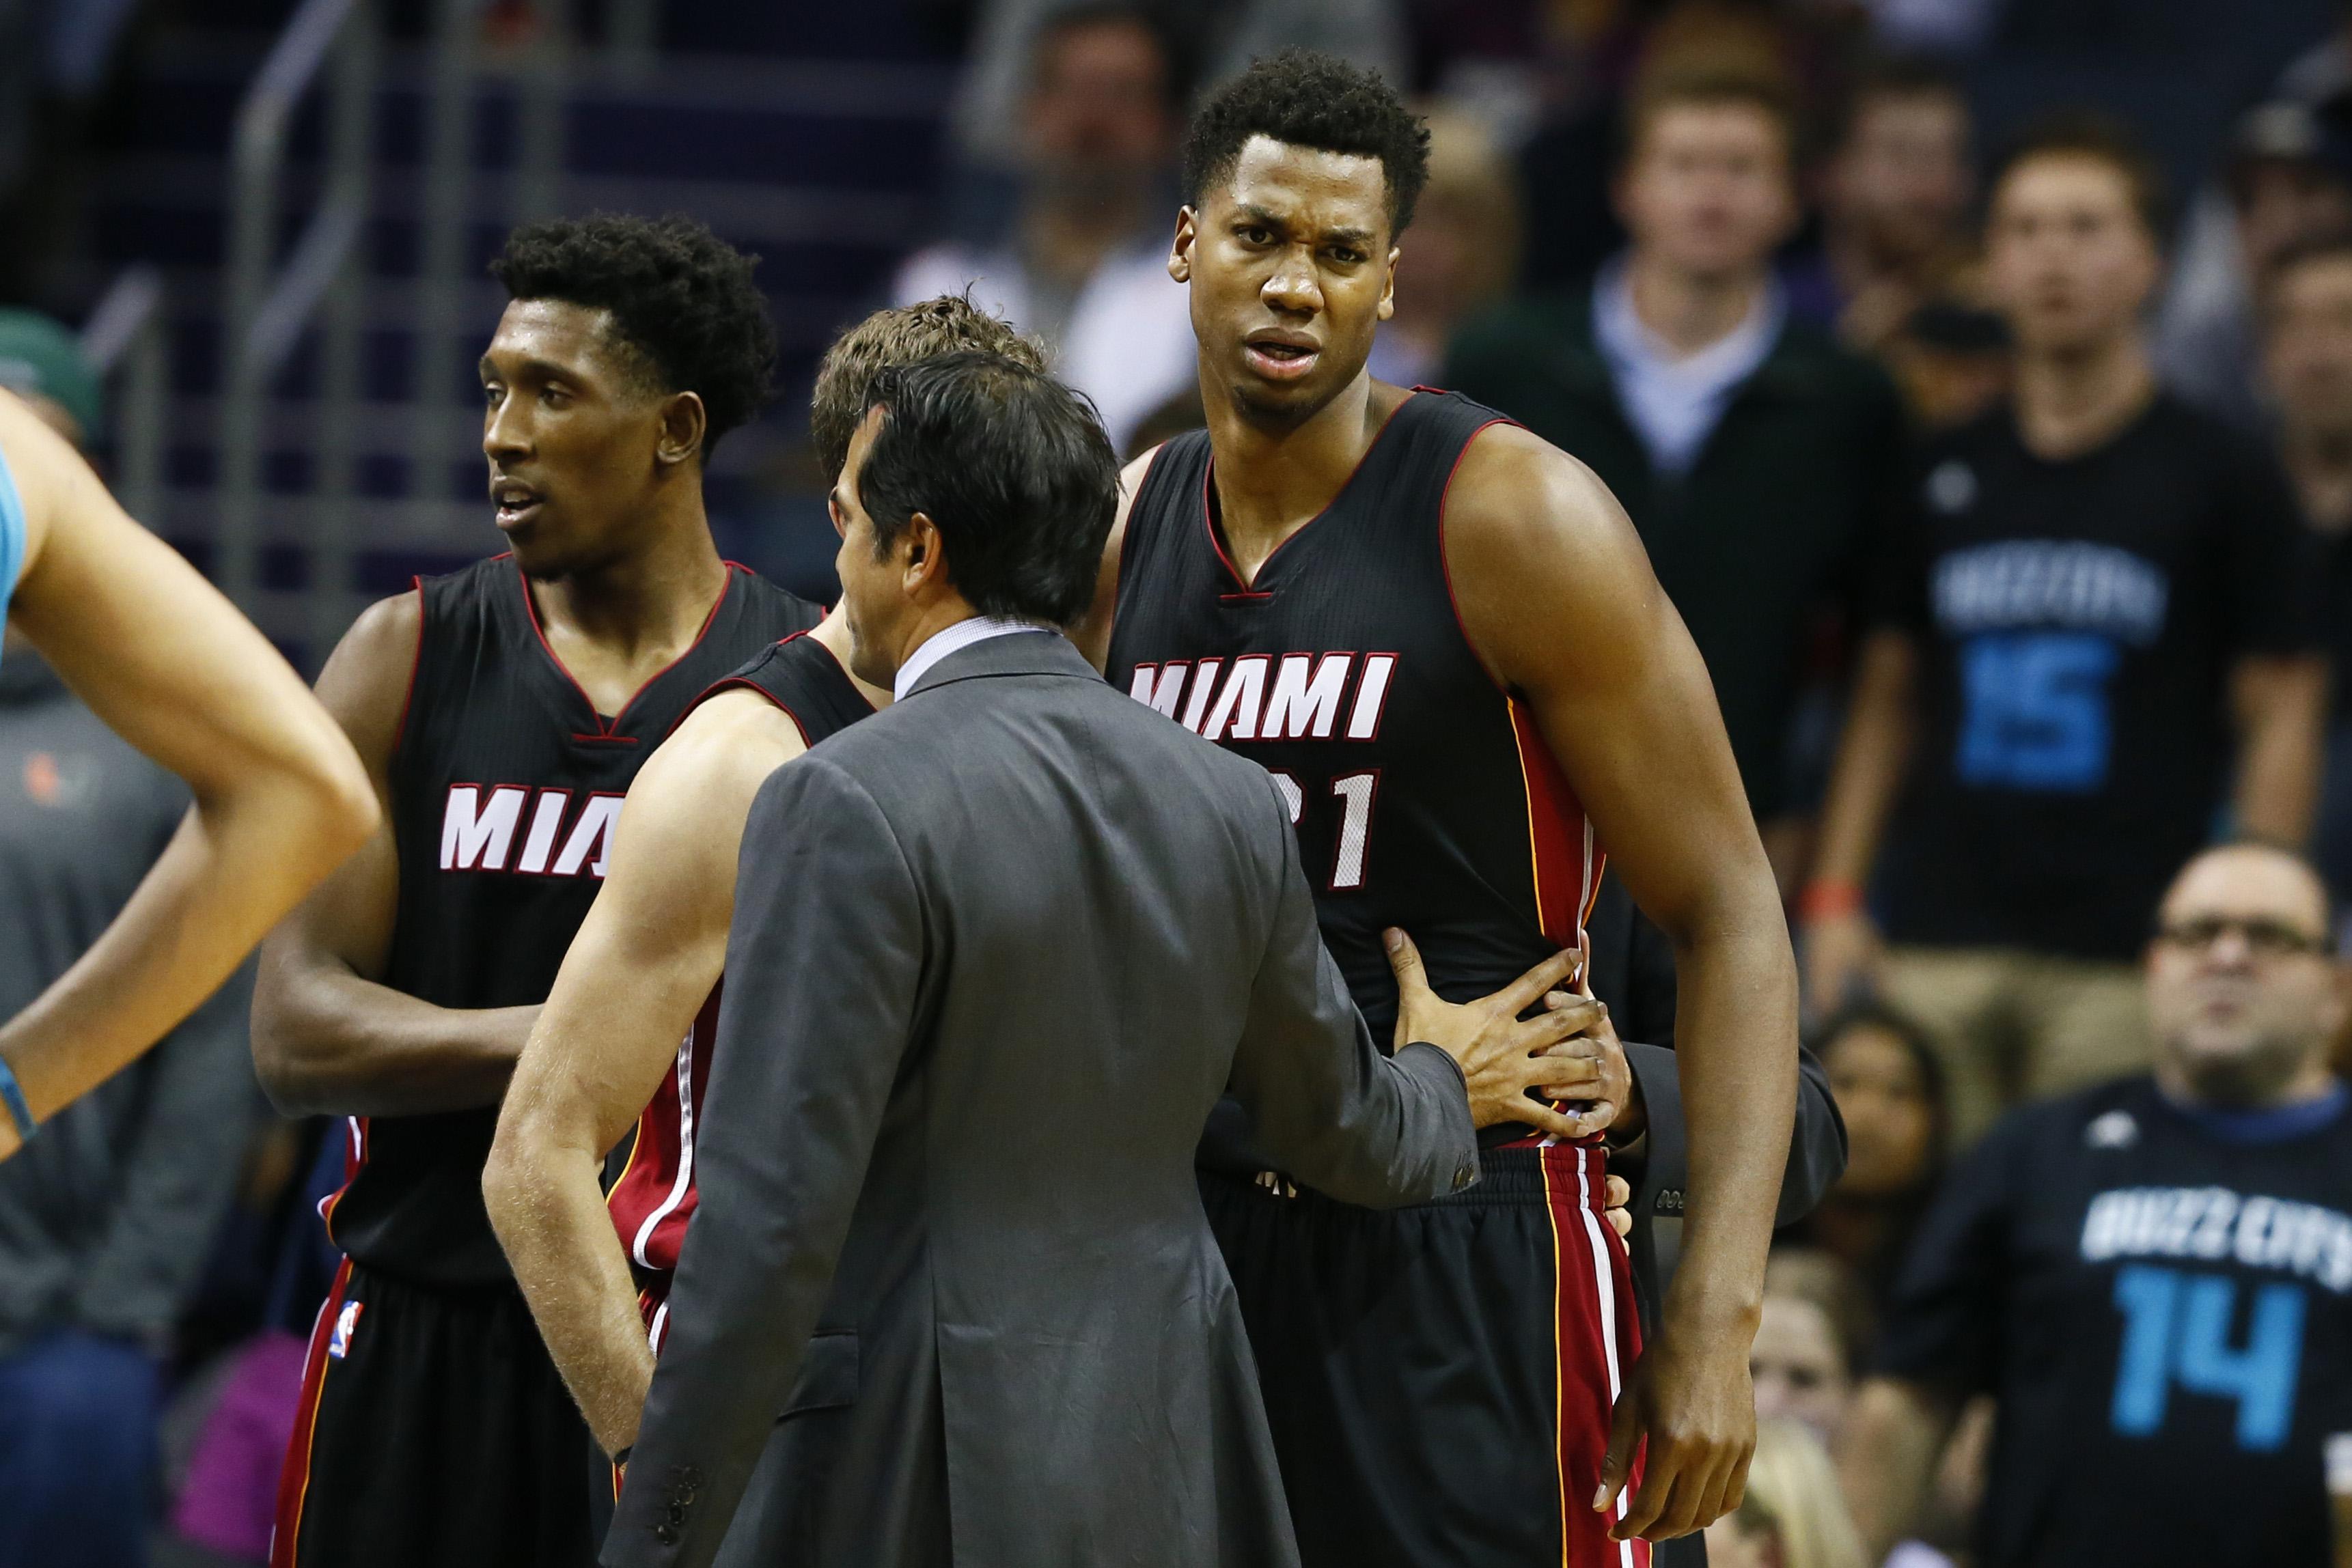 NBA: Miami Heat at Charlotte Hornets